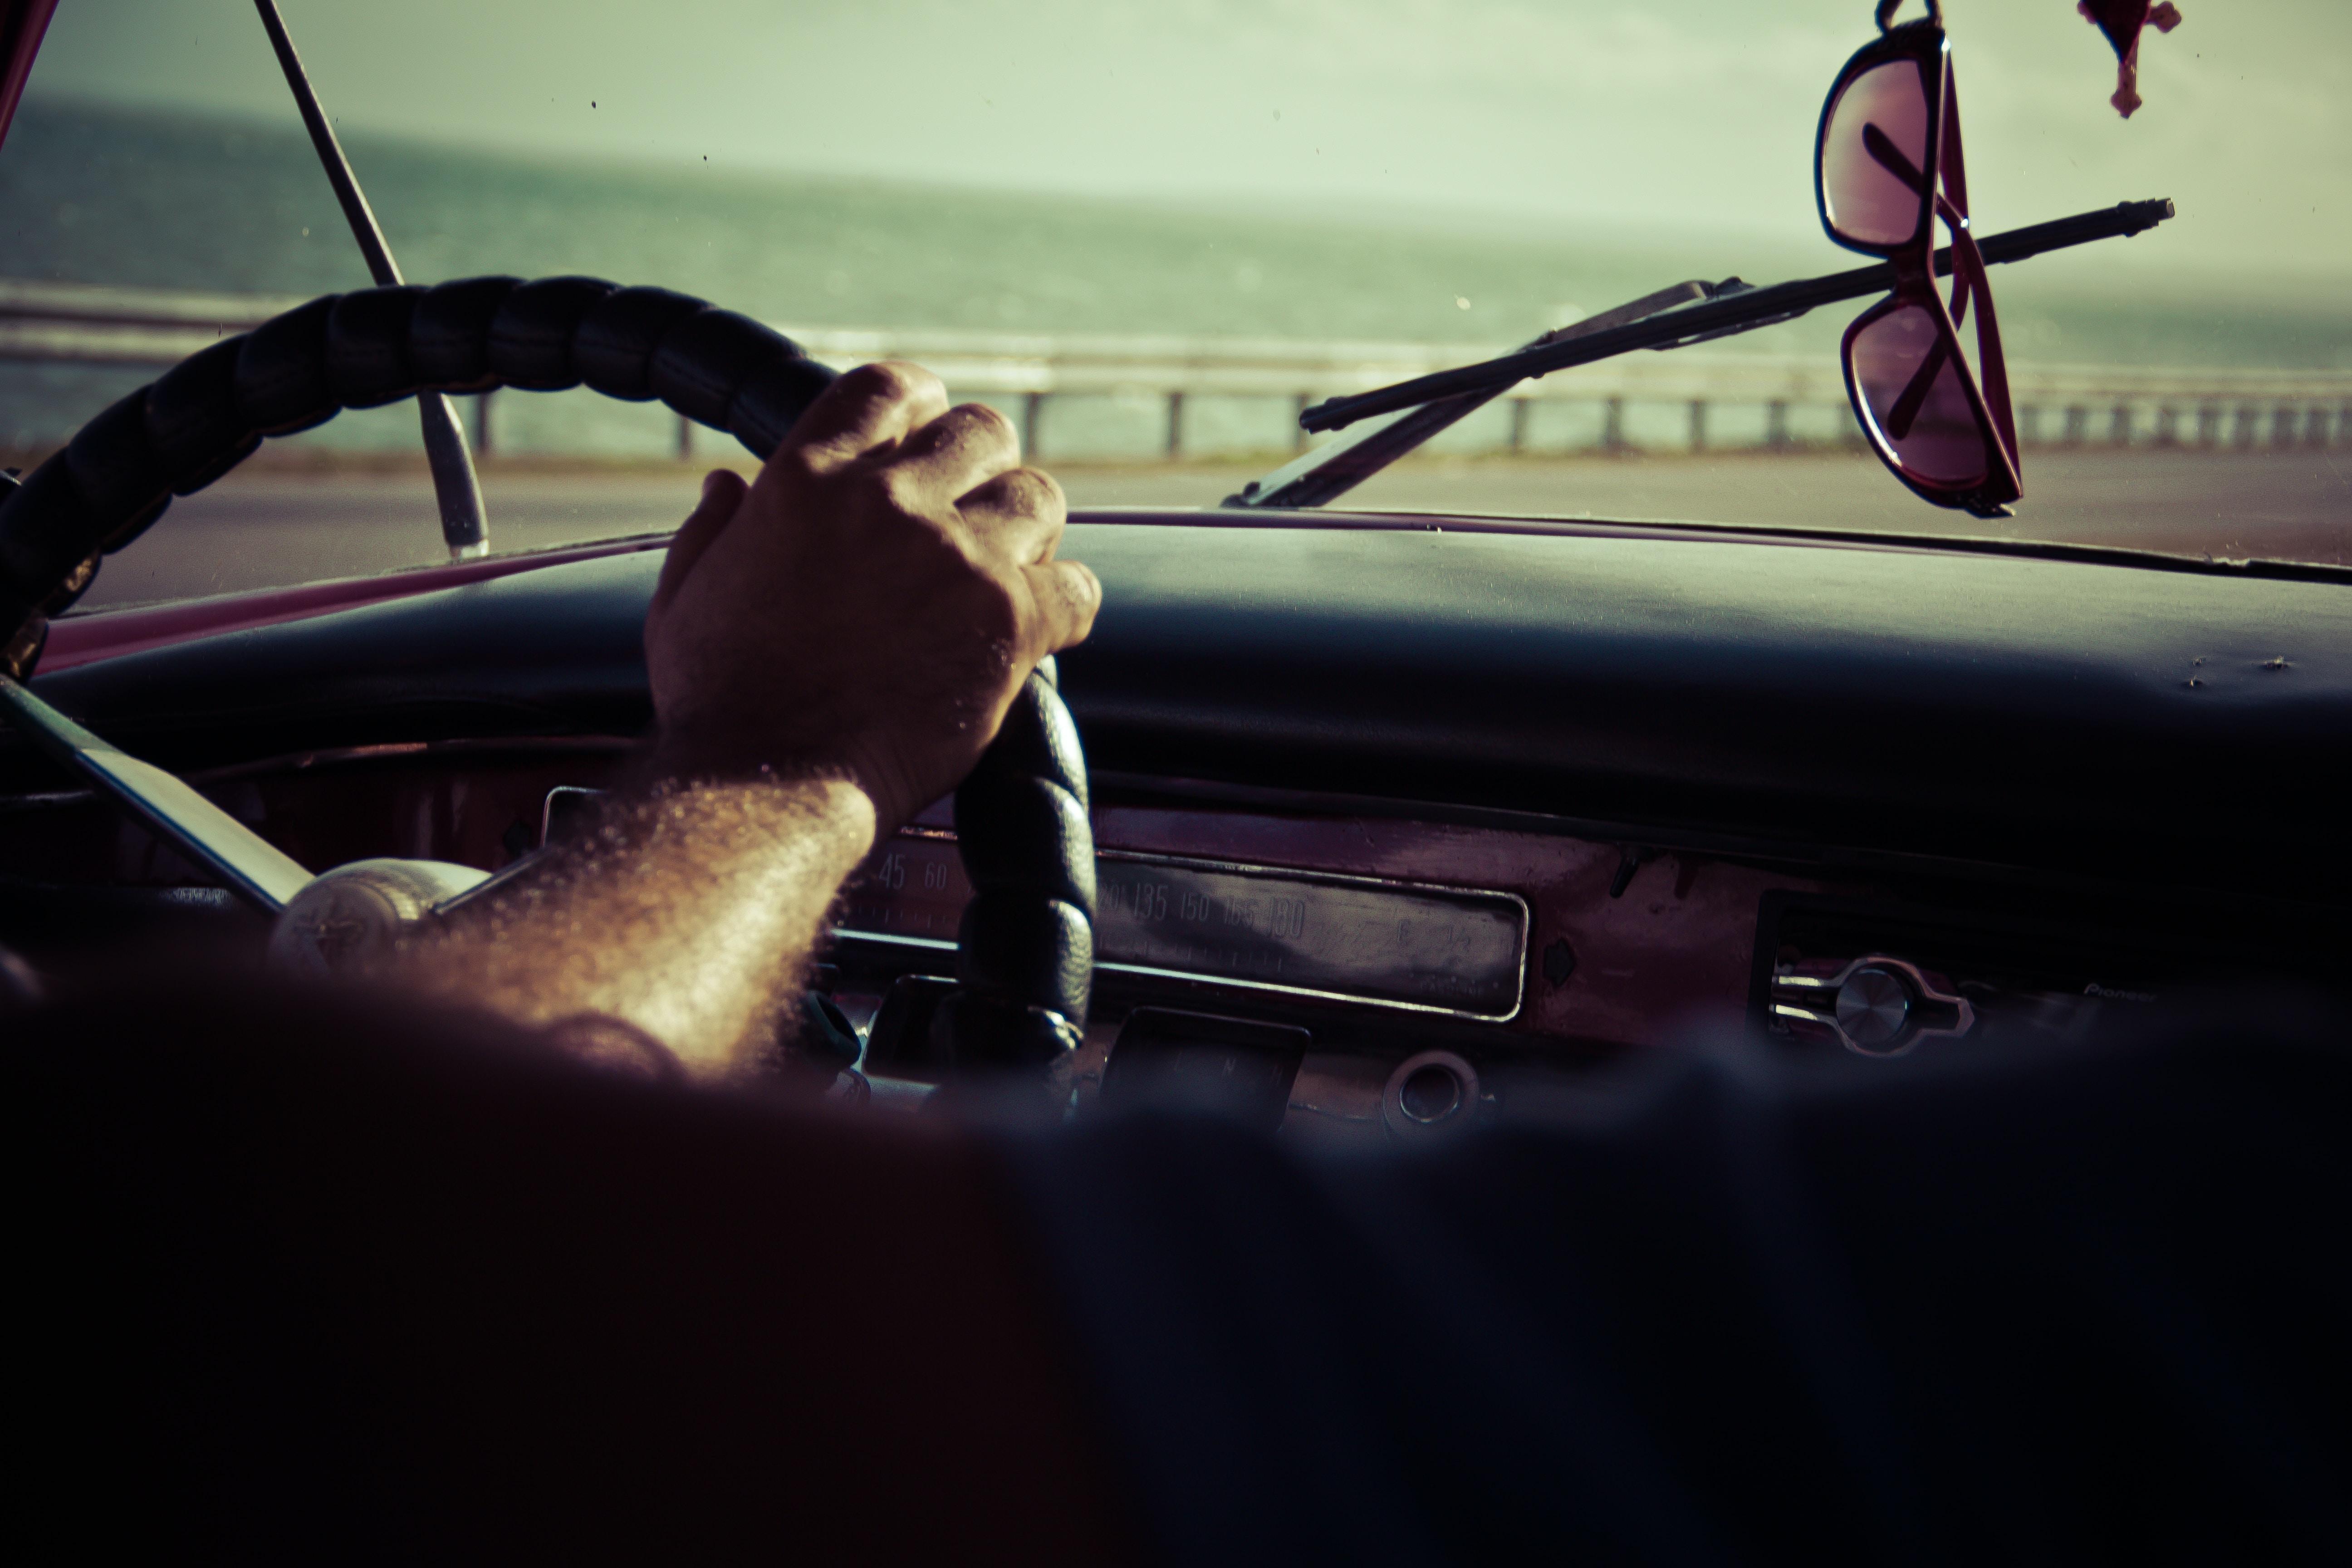 Interior back seat shot of man driving car on sunny day at coast